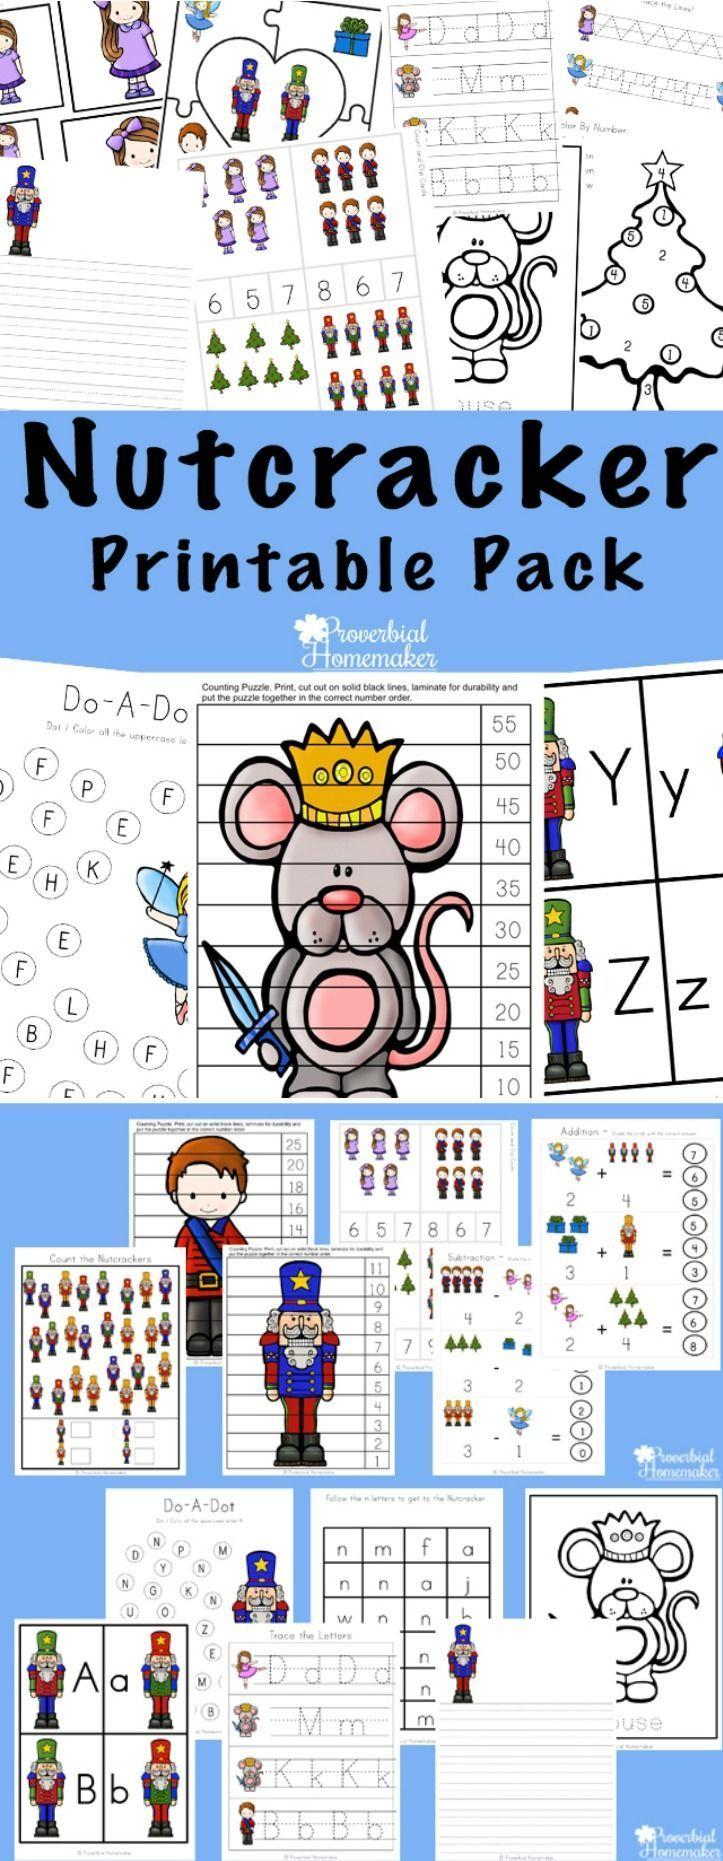 Nutcracker Printable Pack | Preschool printables ...